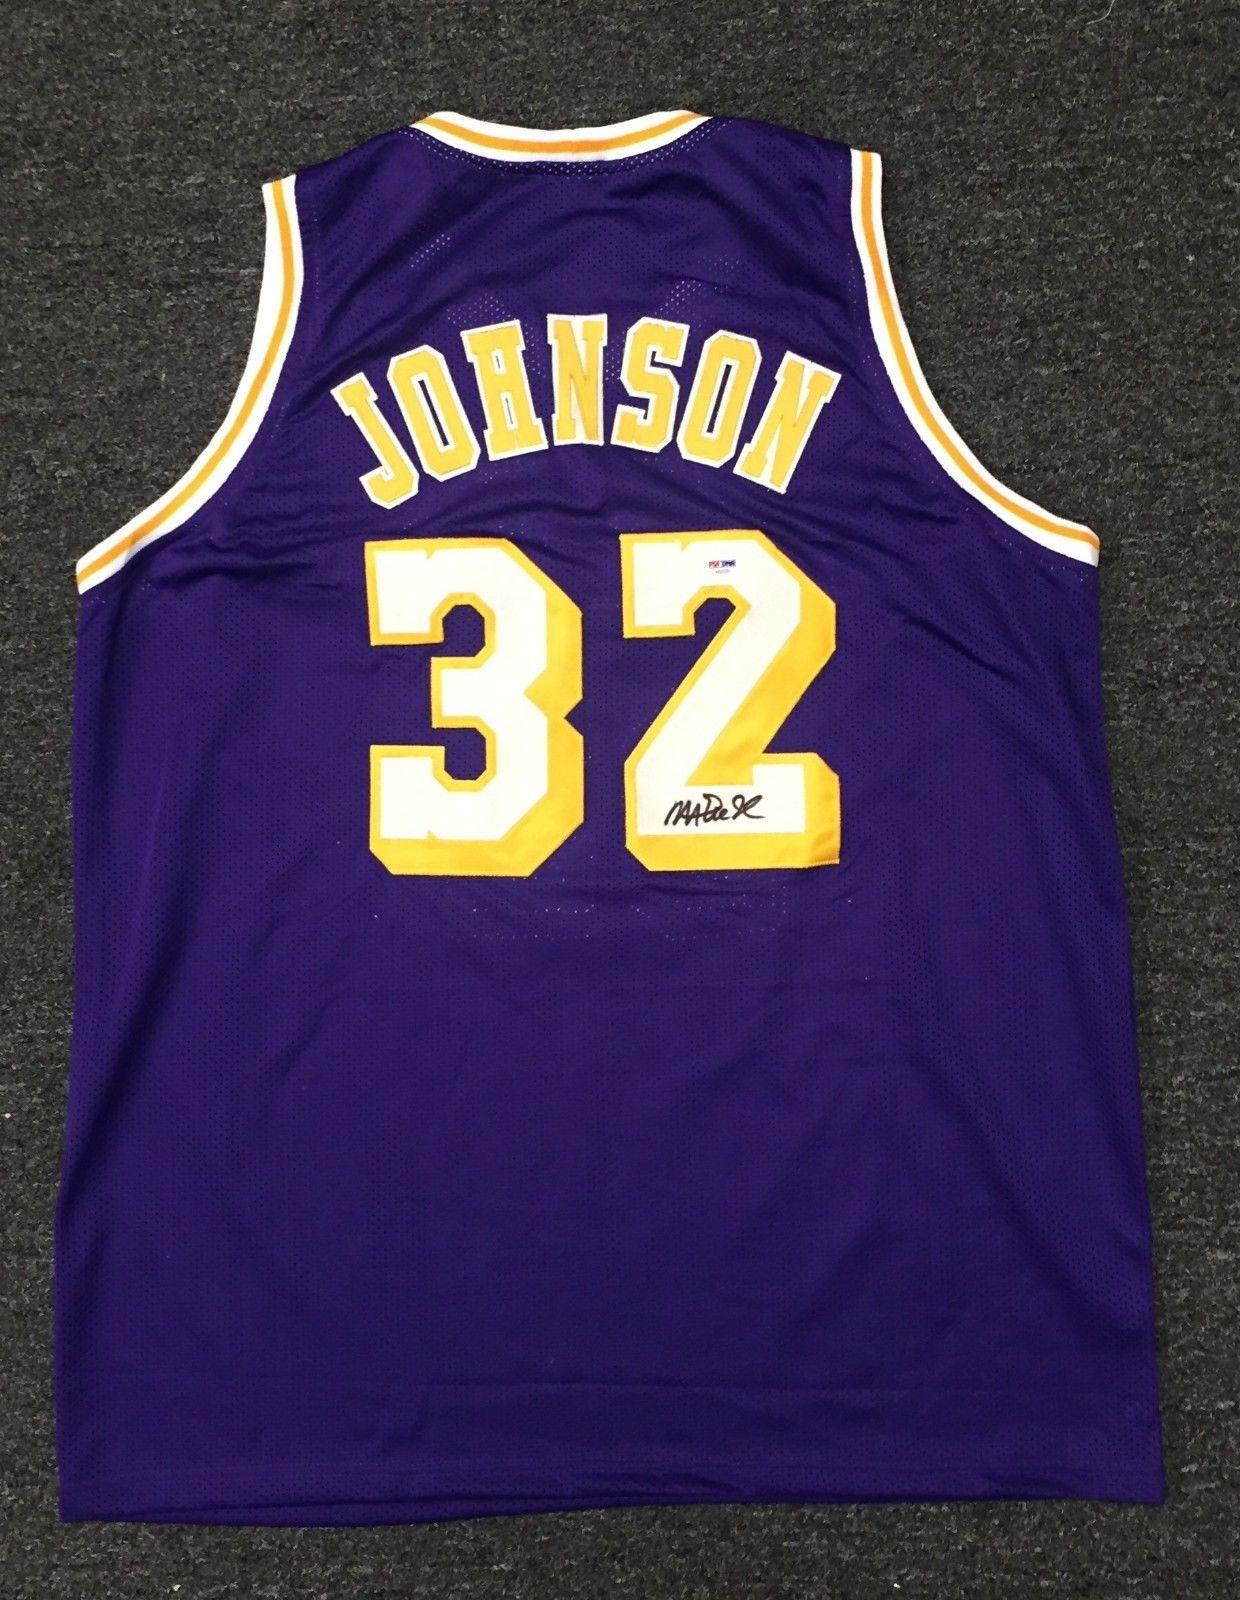 4a1ae2630e7 21908 Magic Johnson #32 Signed Lakers Jersey AUTO Sz XL PSA/DNA COA HOF  #Basketball